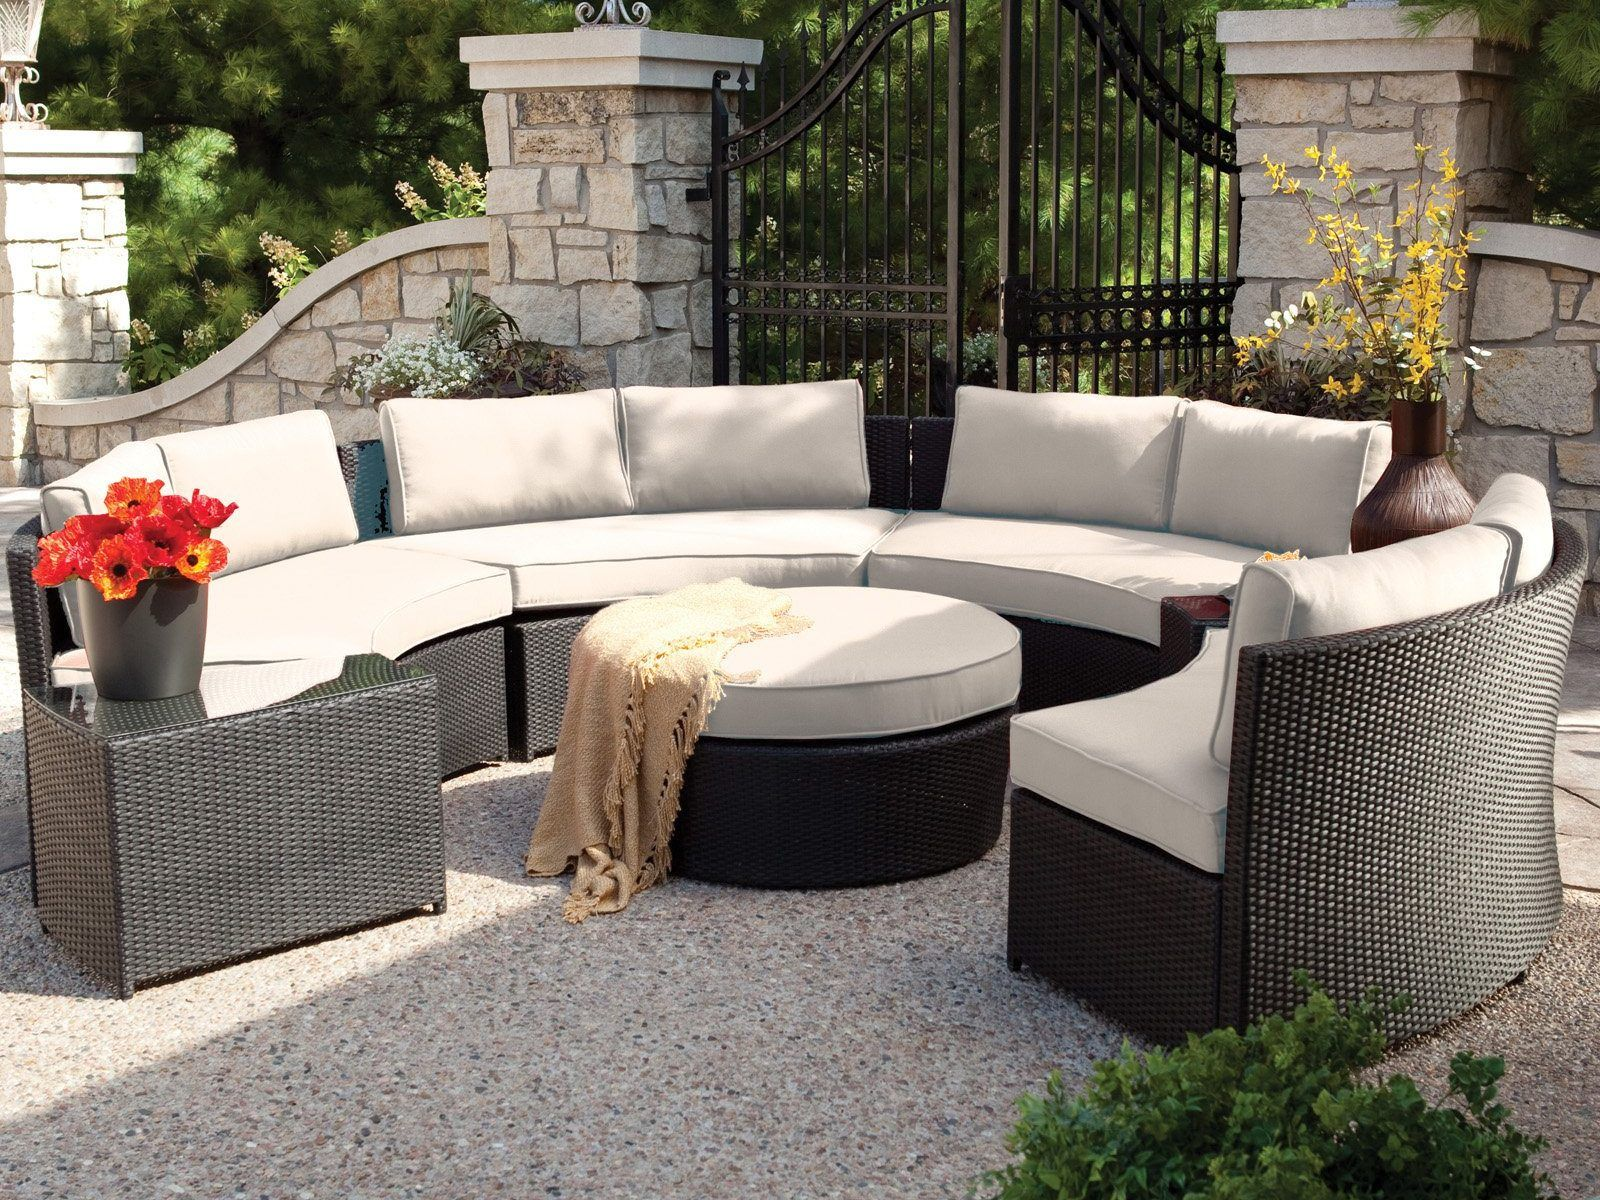 Cheap Outdoor Patio Furniture Sets Patio Ideas Patio Patio